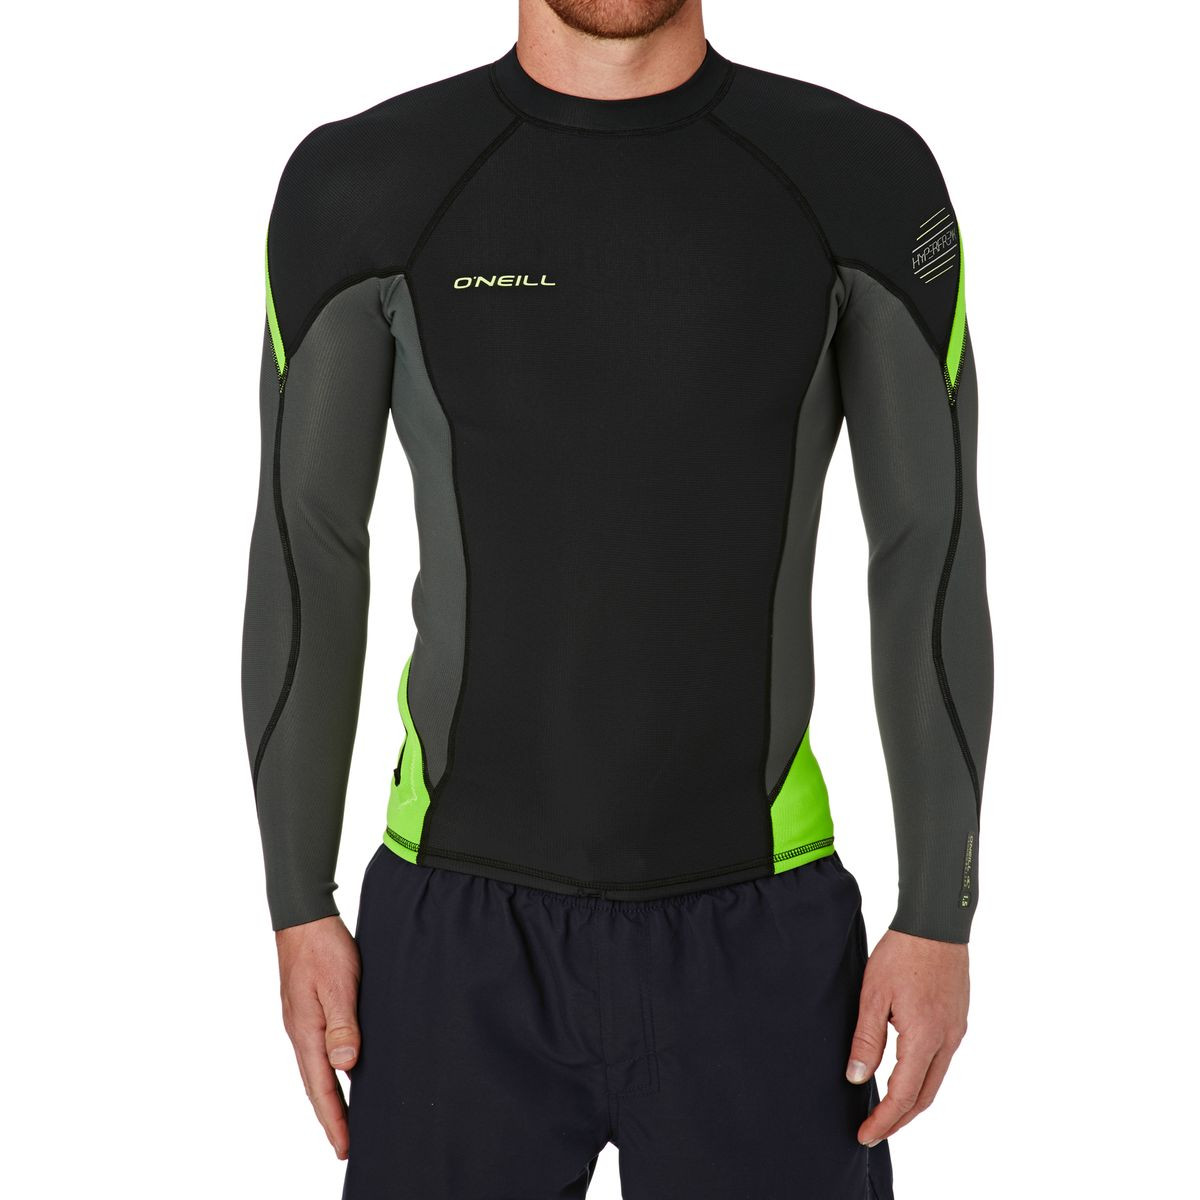 O'Neill Hyperfreak 1.5mm Long Sleeve Crew Wetsuit Jacket - Black/ Graphite/ Dayglow